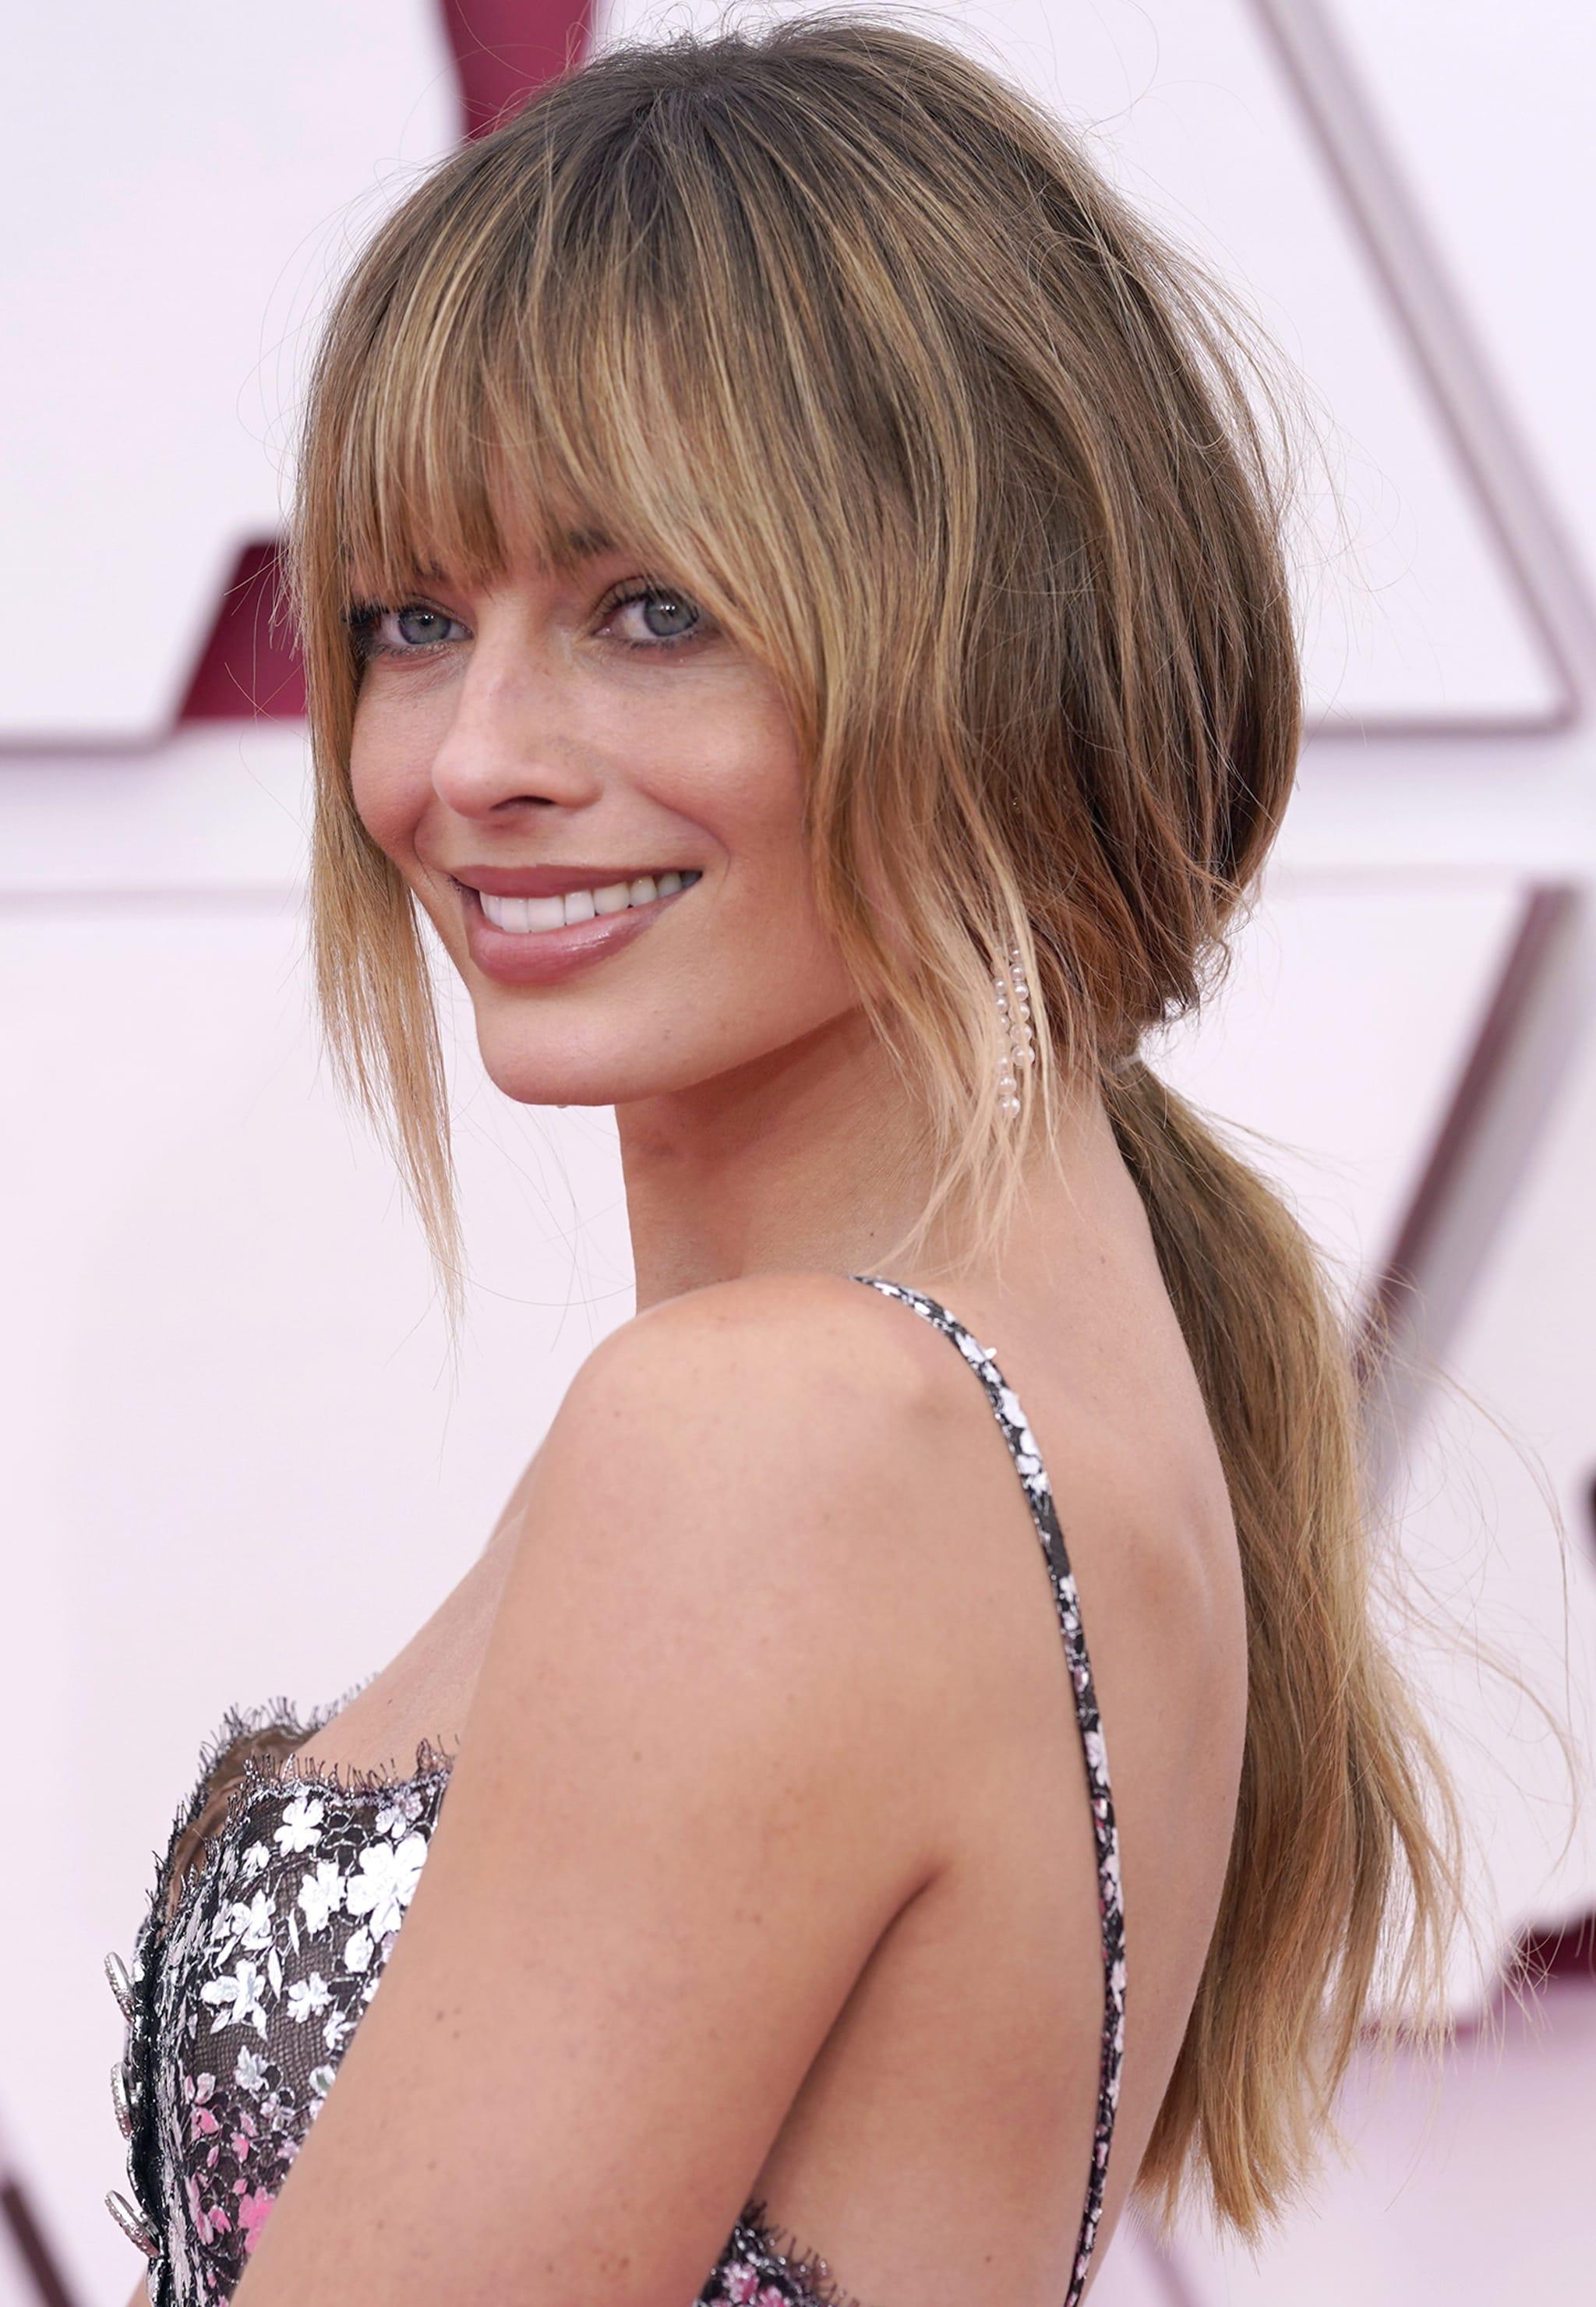 Il nuovo hair look di Margot Robbie